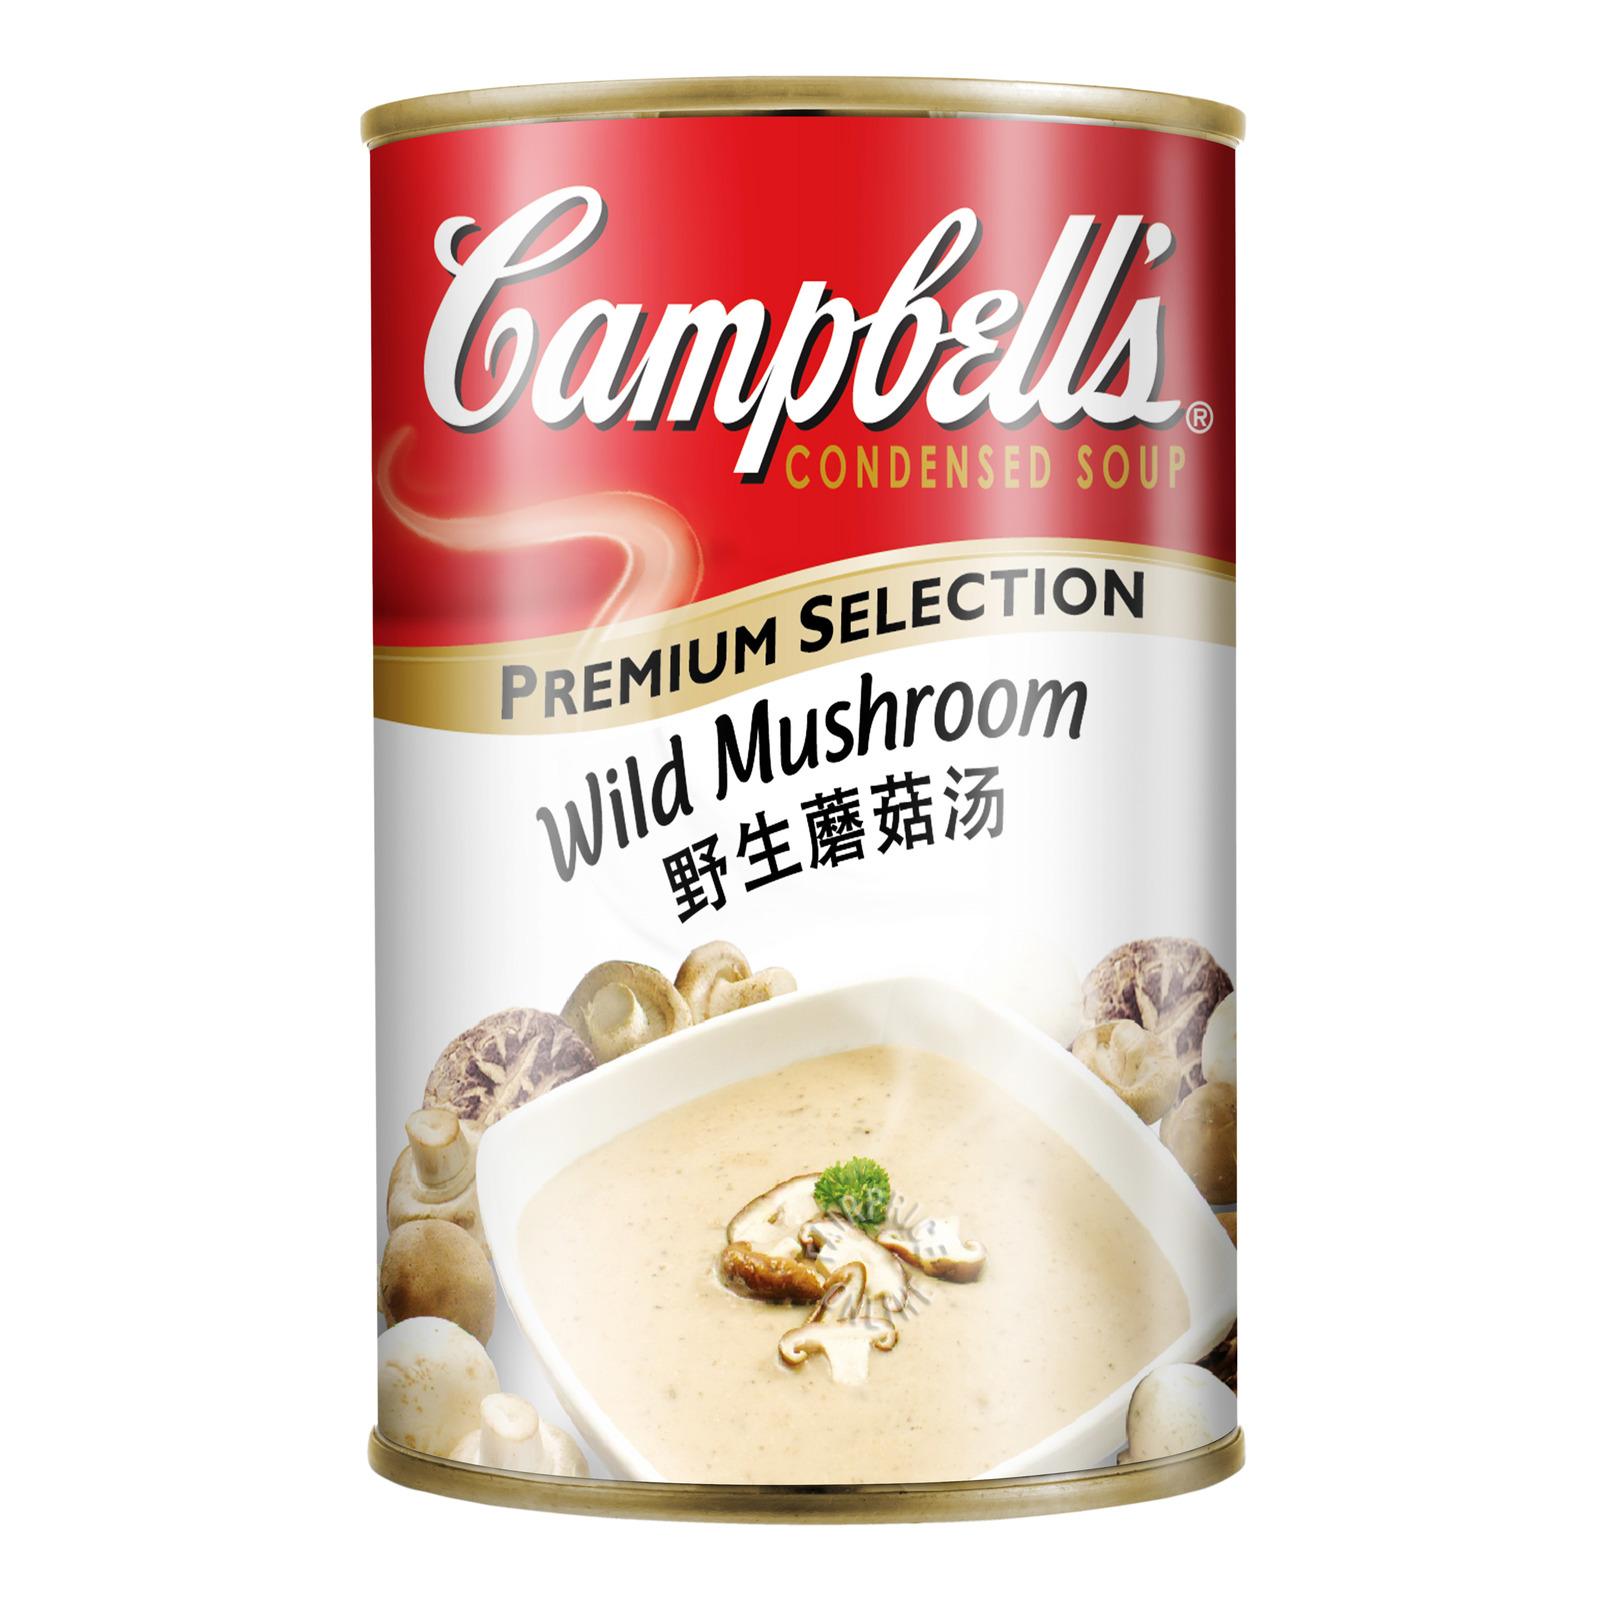 Campbell's Premium Selection Soup - Wild Mushroom